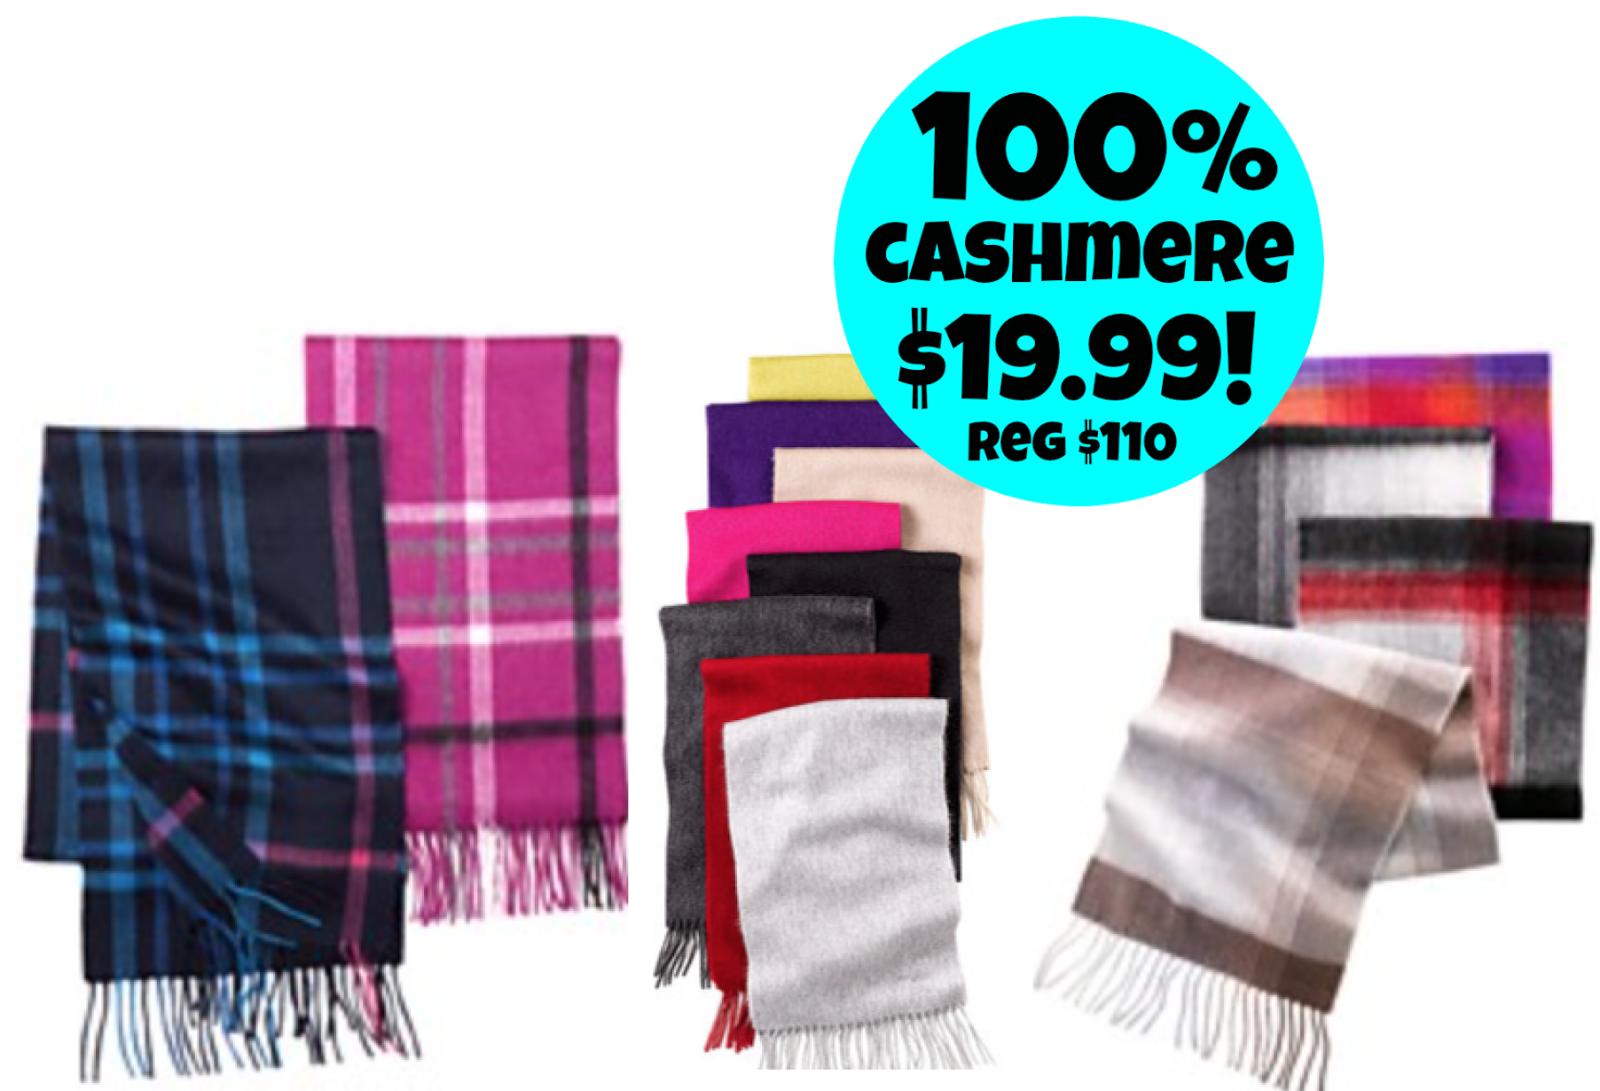 http://www.thebinderladies.com/2015/02/macys-com-100-cashmere-scarves-1999.html#.VN0KnYfduyM